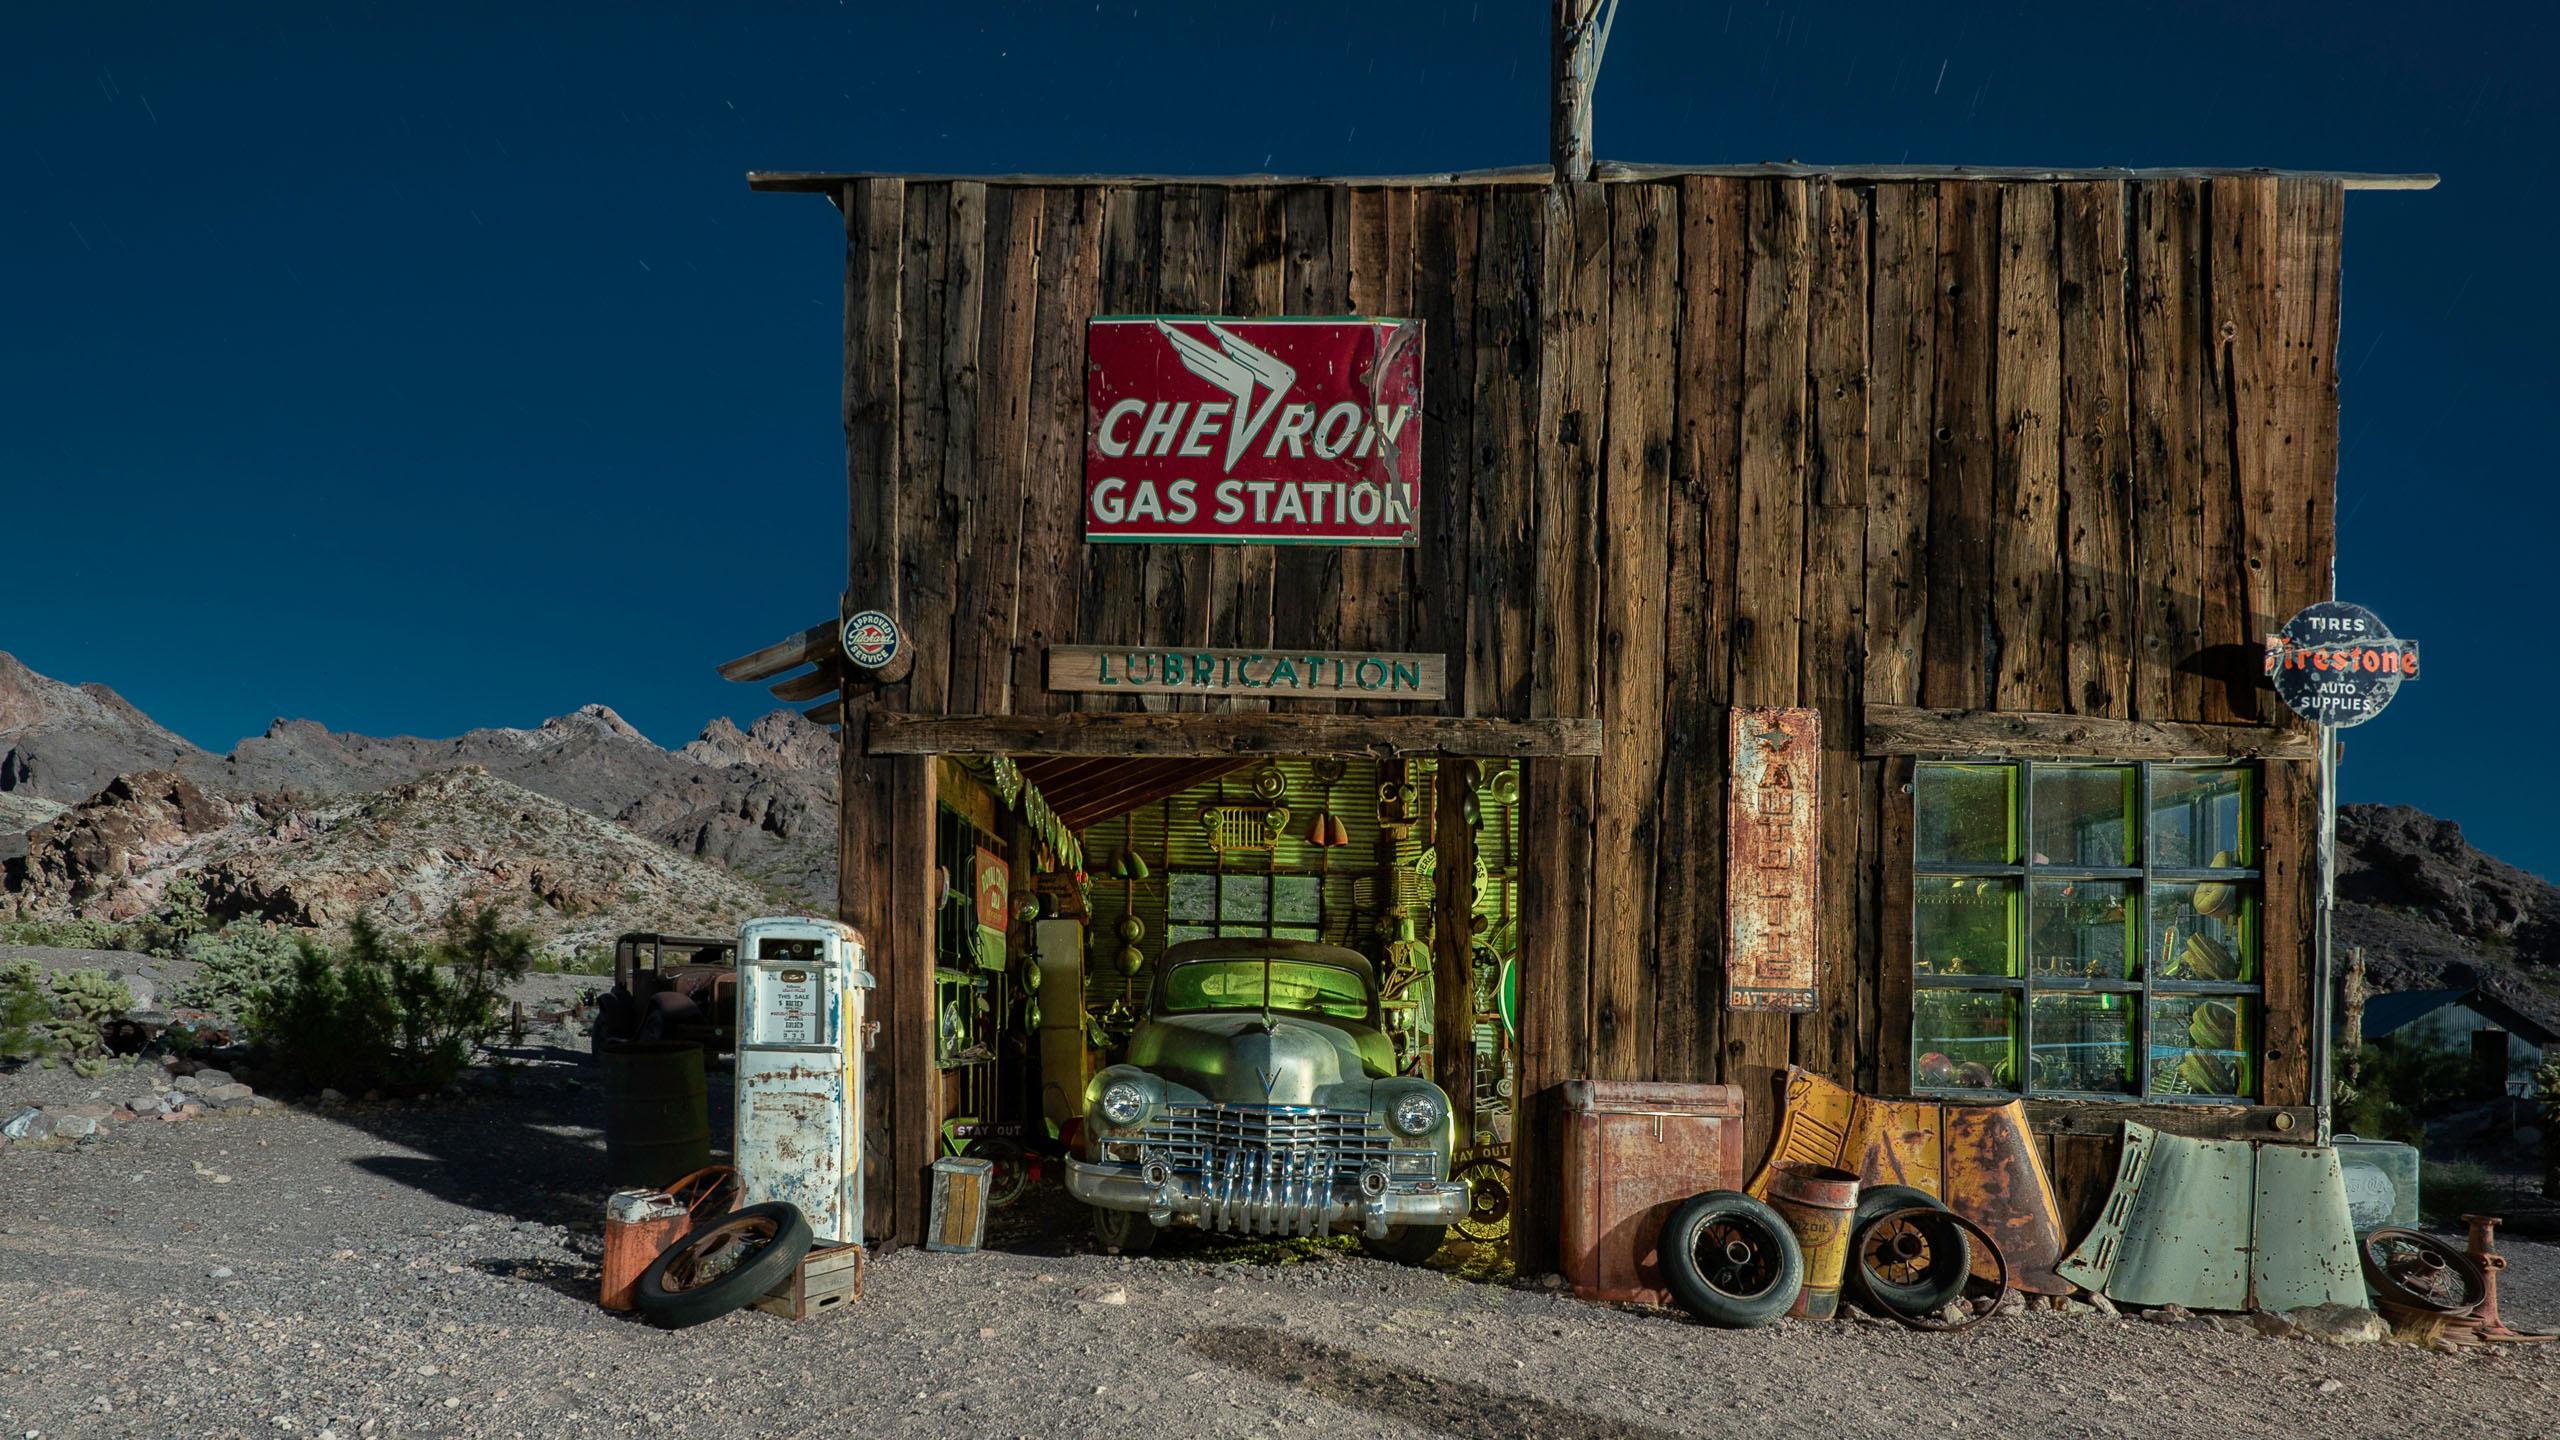 4104_kenlee_arizona-and-nevada_190715_2117_396sf8iso200_nelson-garage-front-HEADER-PHOTOFOCUS